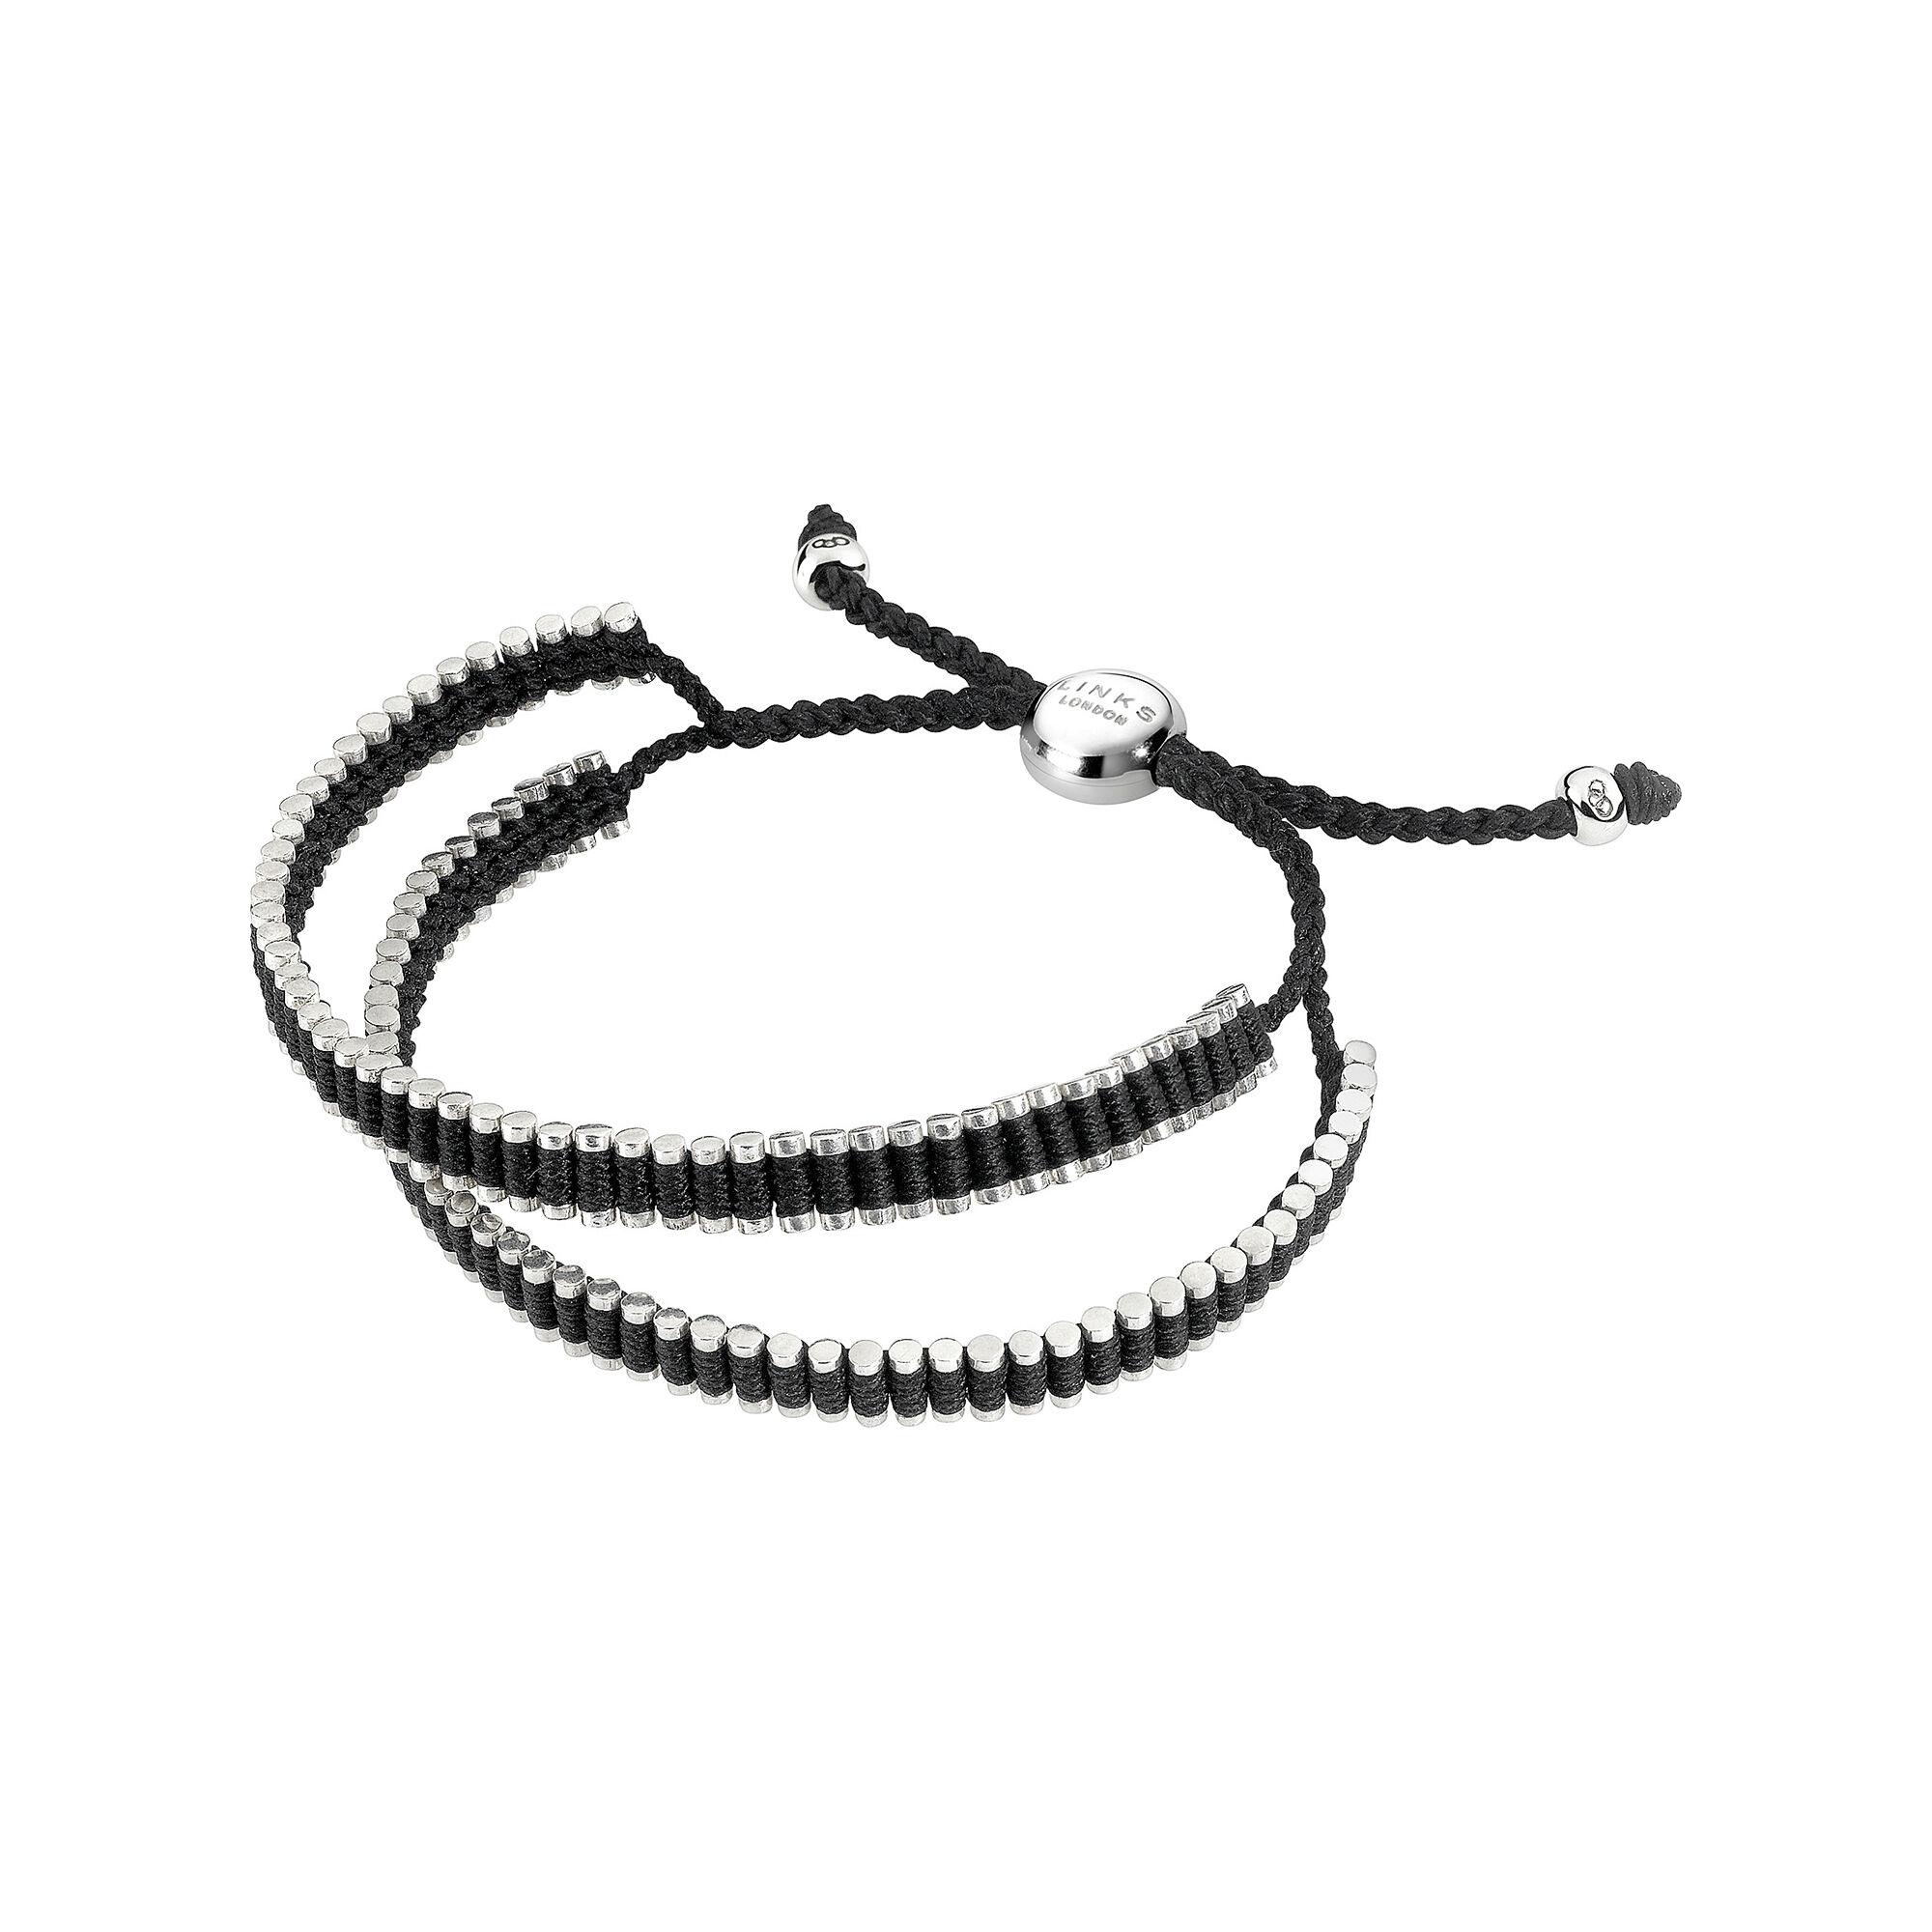 Venture mens black leather bracelet men bracelets links of london - Friendship Mens Sterling Silver Amp Black Cord Double Wrap Bracelet Hires